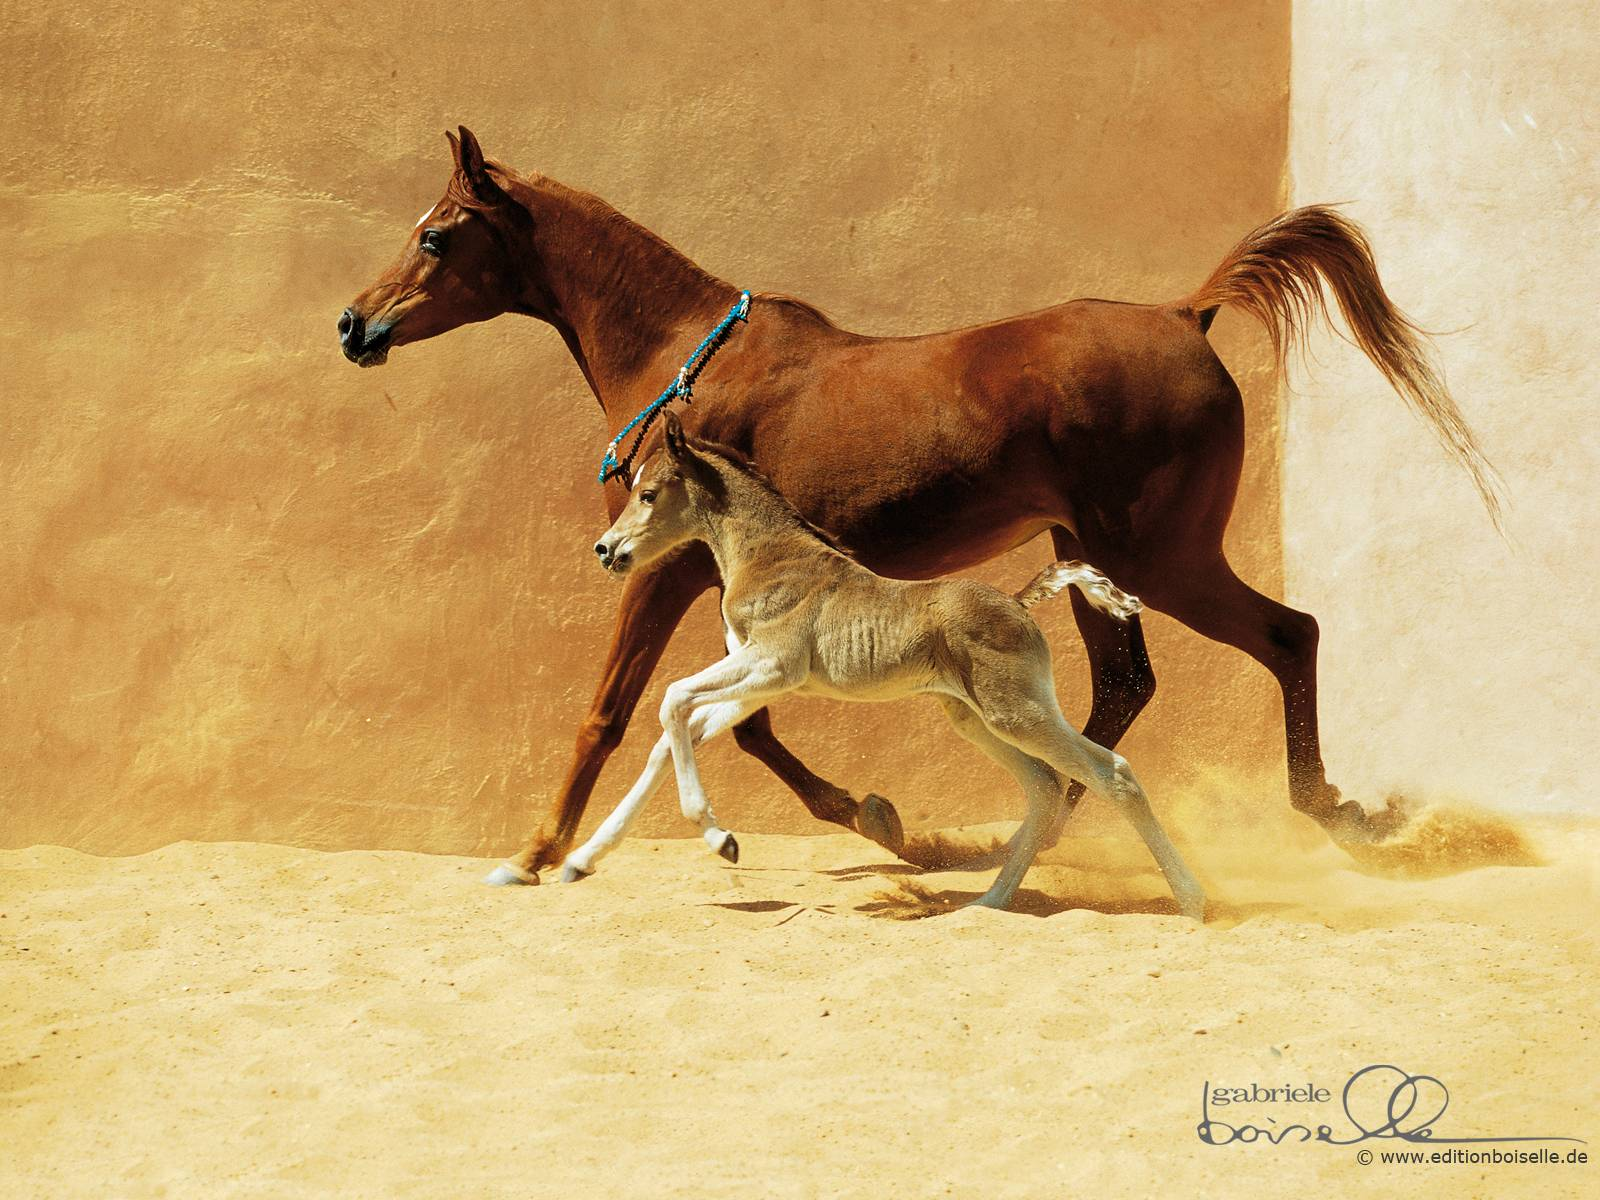 Cute horse wallpapers wallpaper cave arabian horse hd wallpapers horse desktop wallpapers cool thecheapjerseys Choice Image